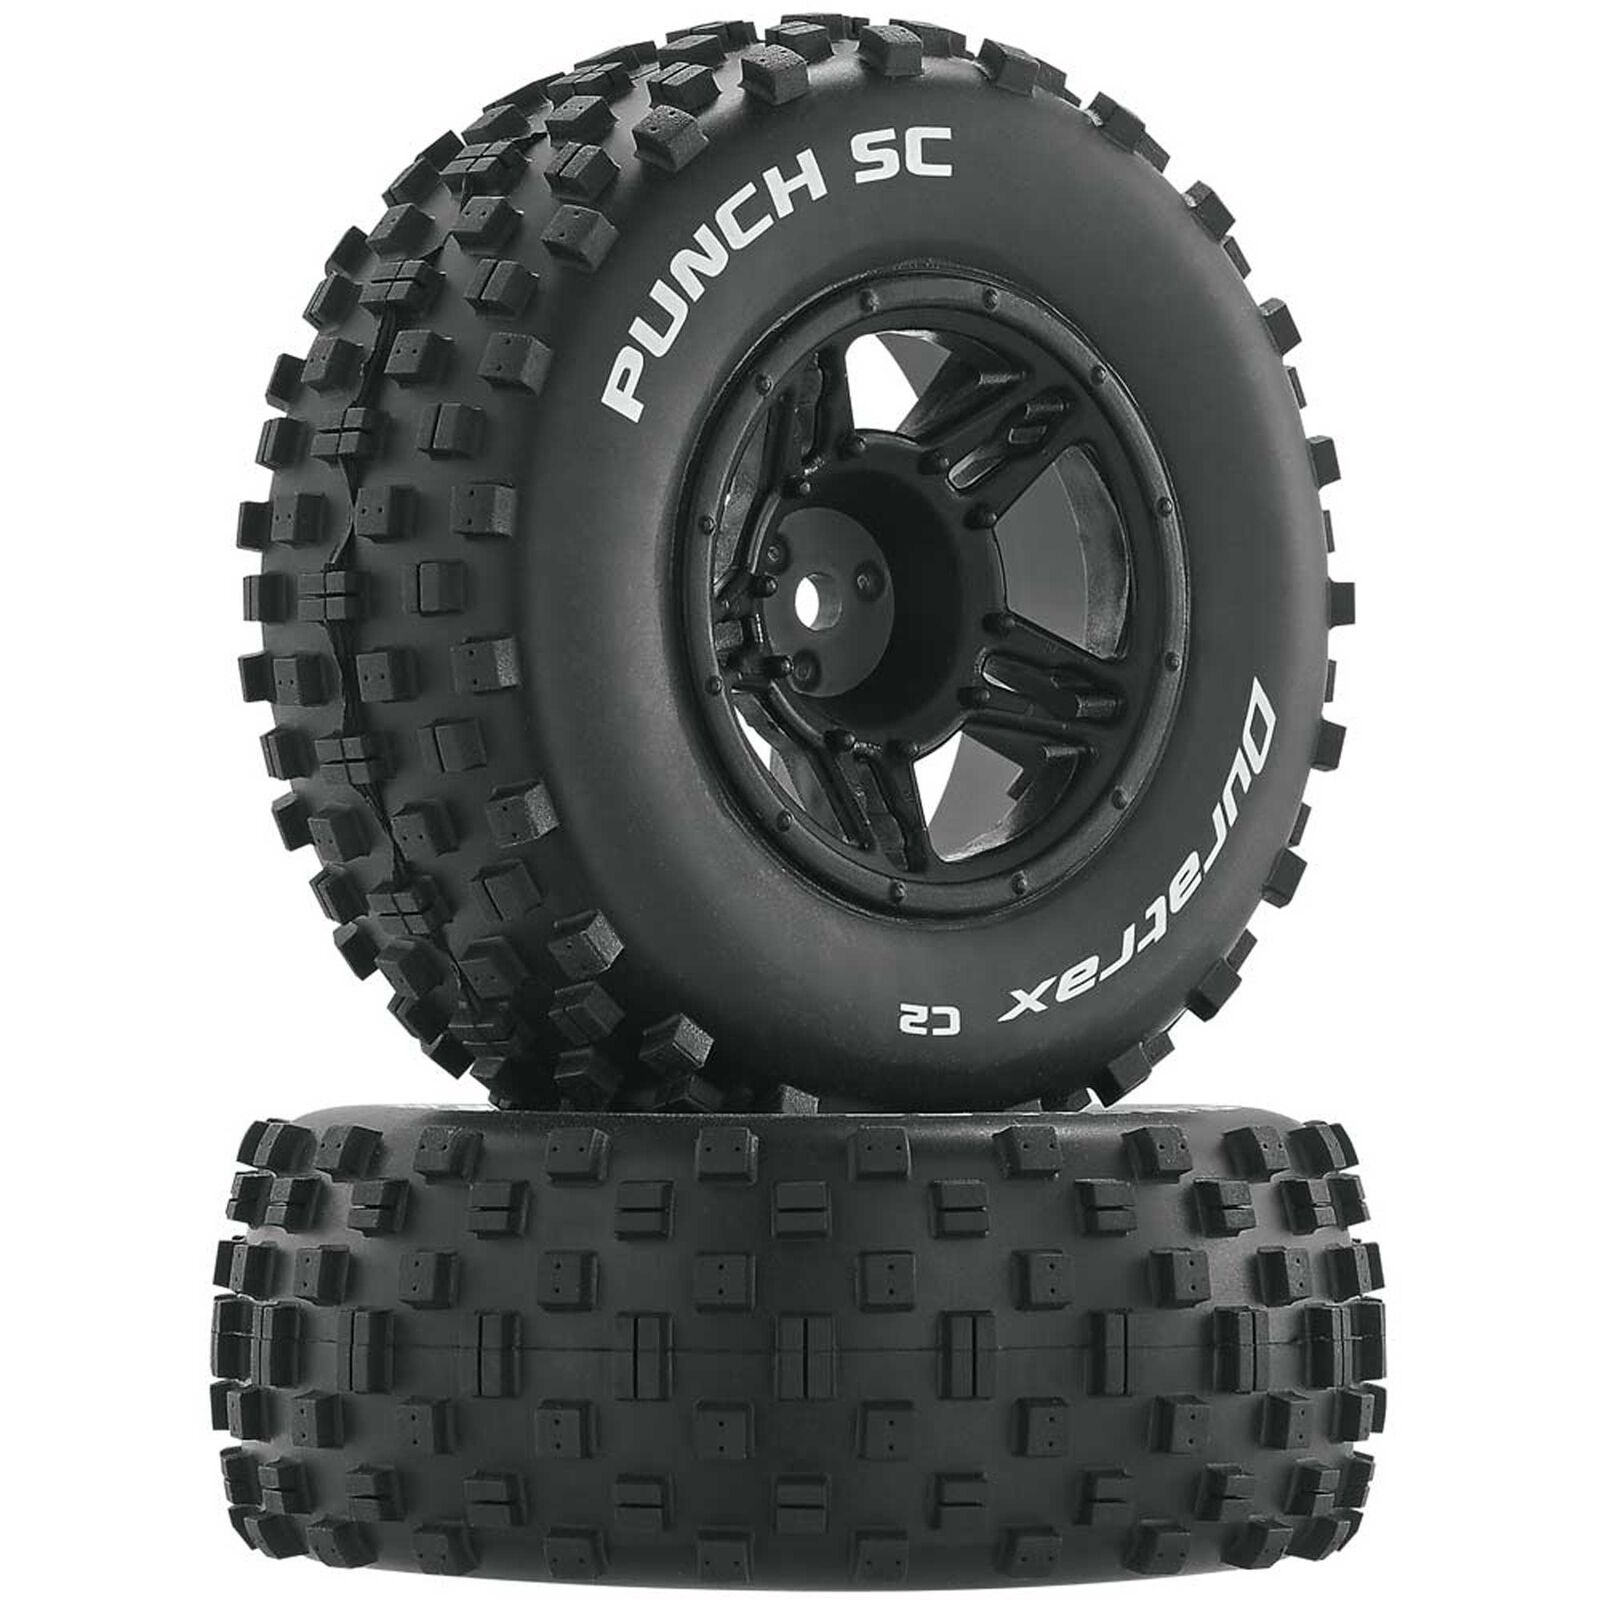 Punch SC C2 Mounted Front Tires: Slash (2)